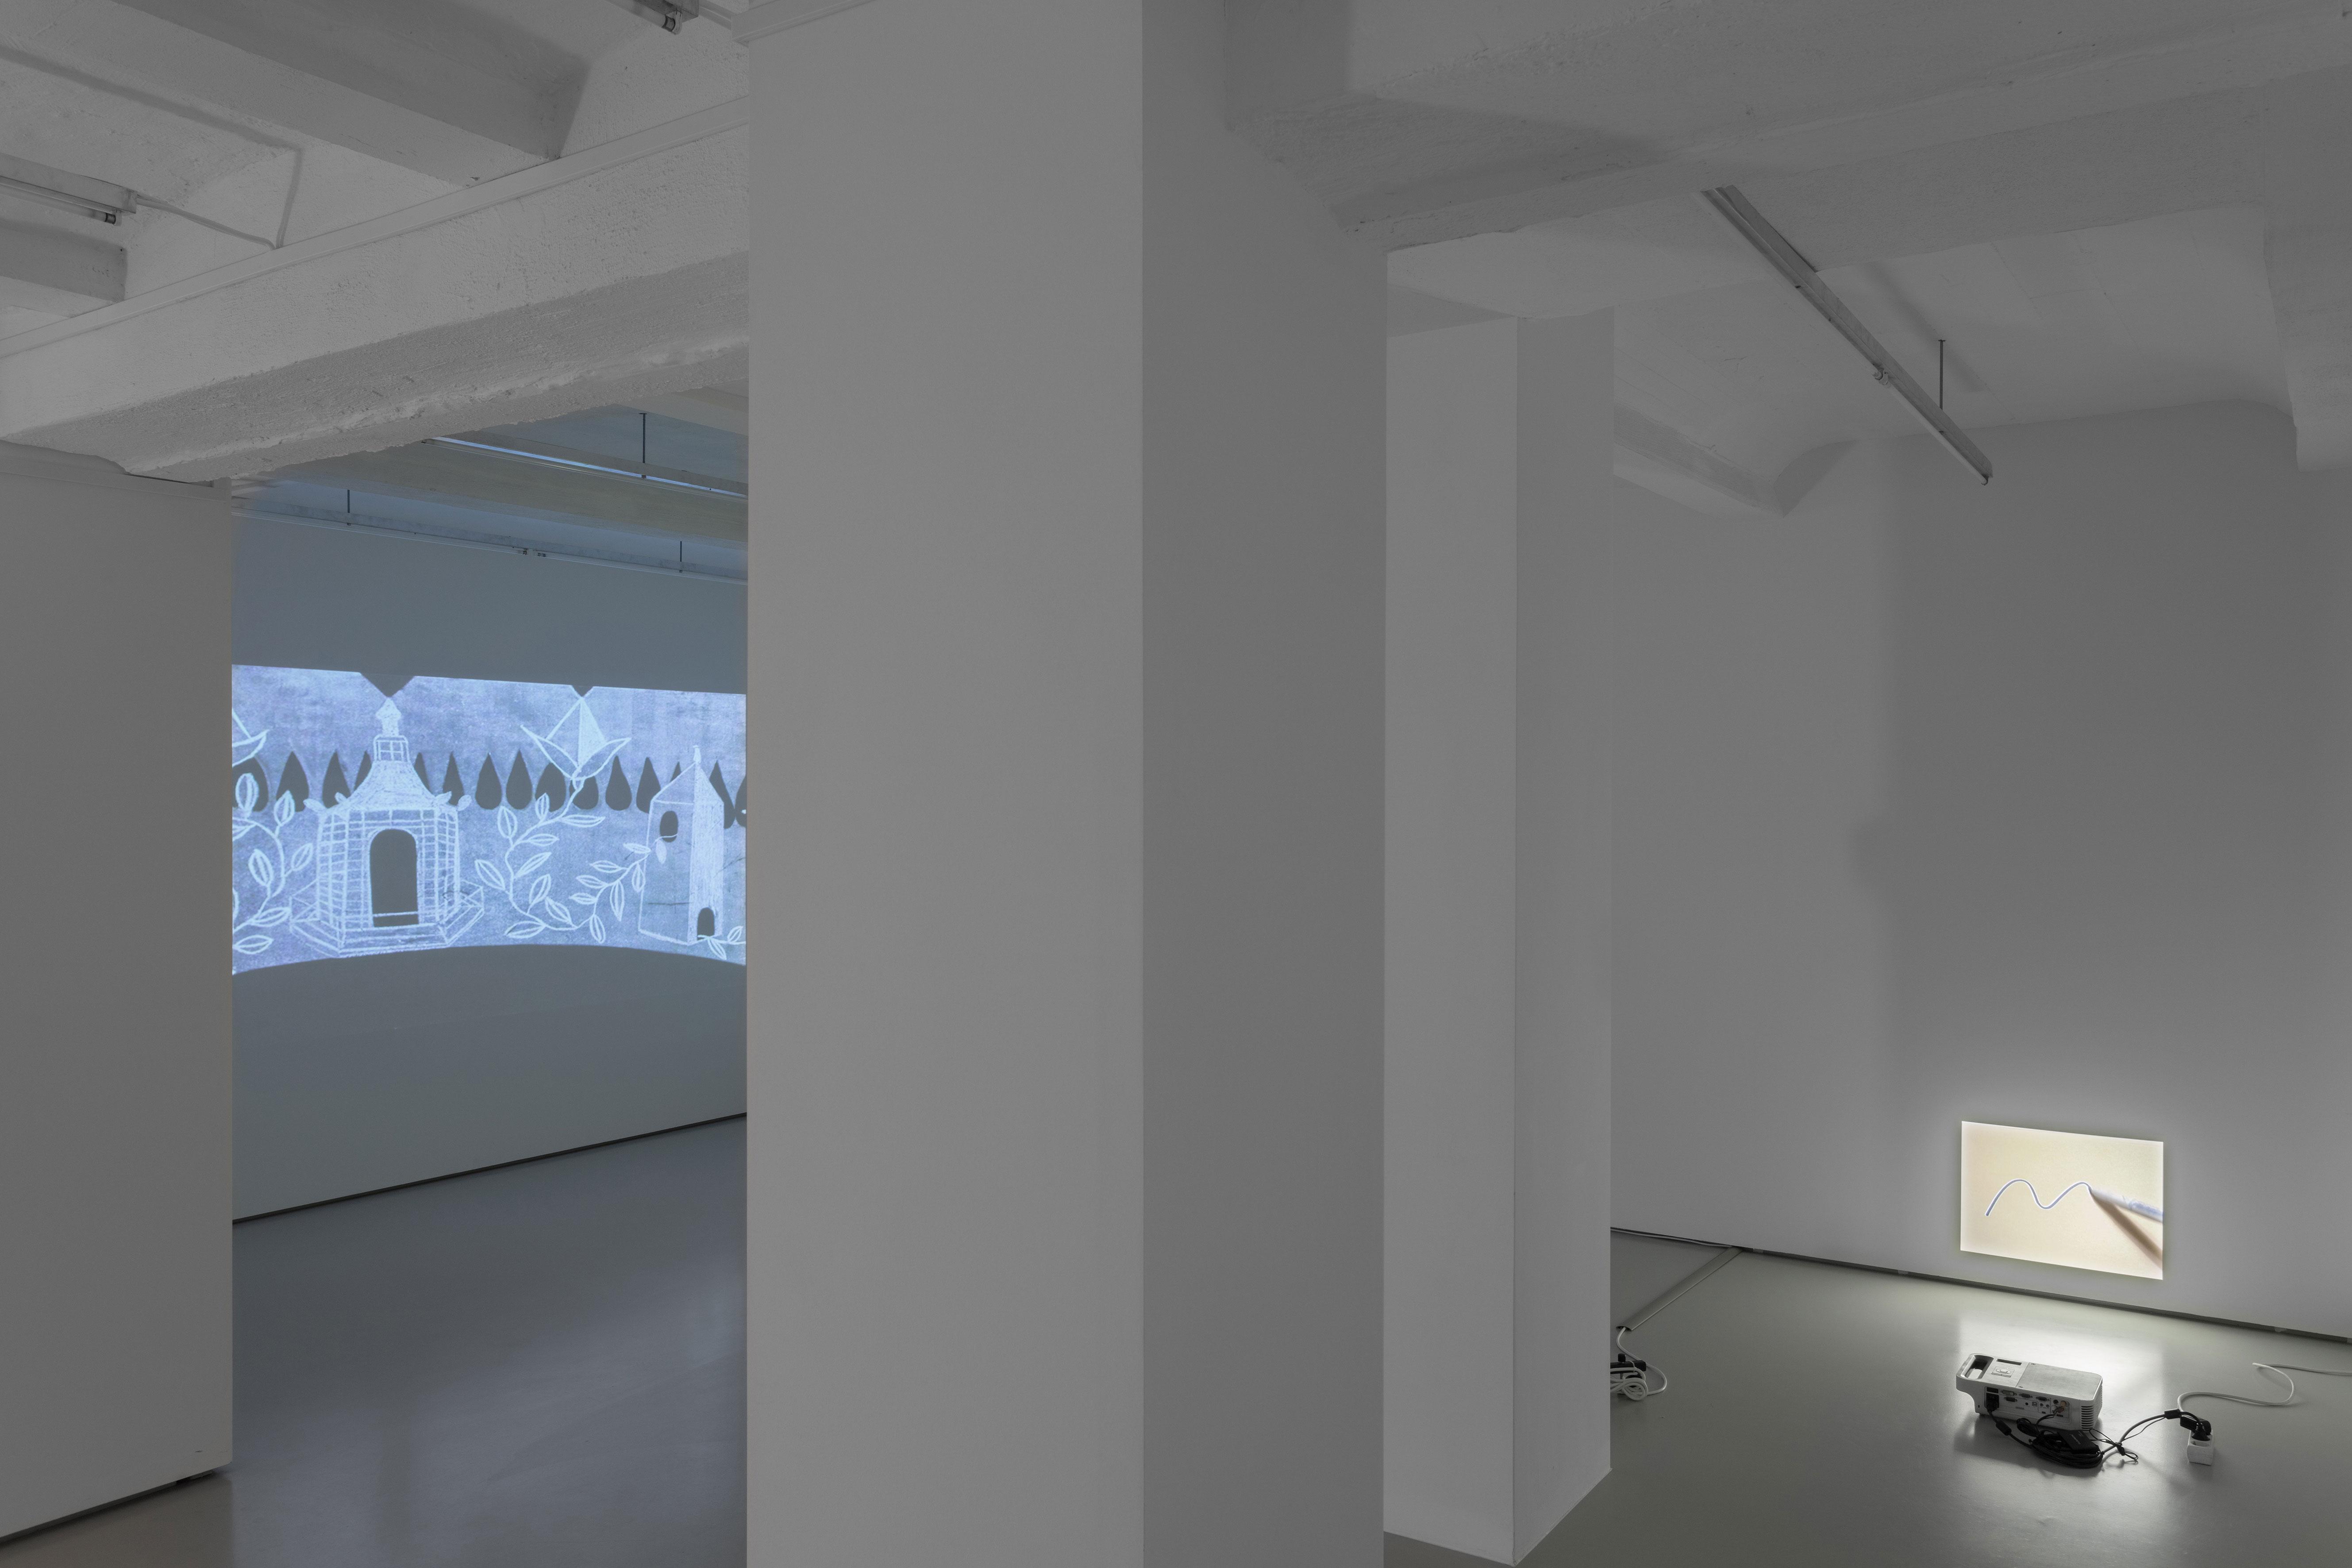 Mladen Stropnik with Jen Liu and Marko Tadic, 13 fifteen, exhibition view at Gregor Podnar, Berlin, 2020. Photo: Marjorie Brunet Plaza